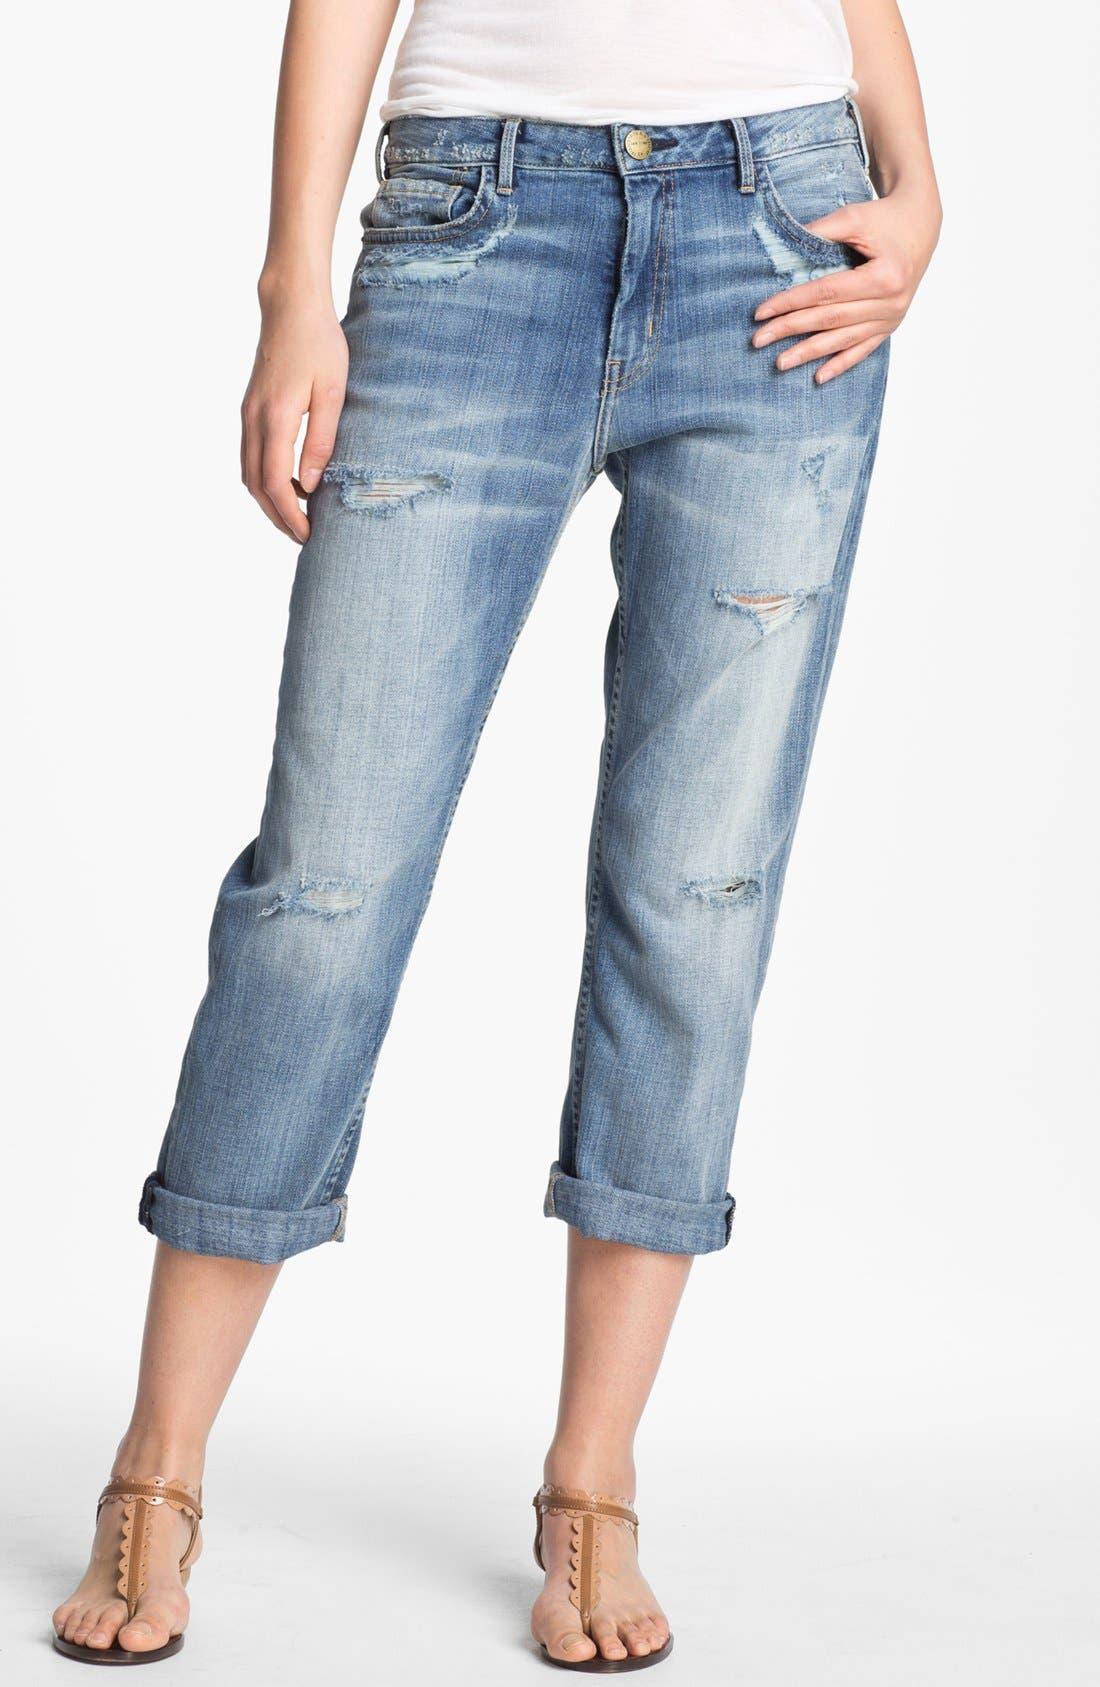 Main Image - Current/Elliott Hand Distressed Jeans (Shipwreck Destroy)